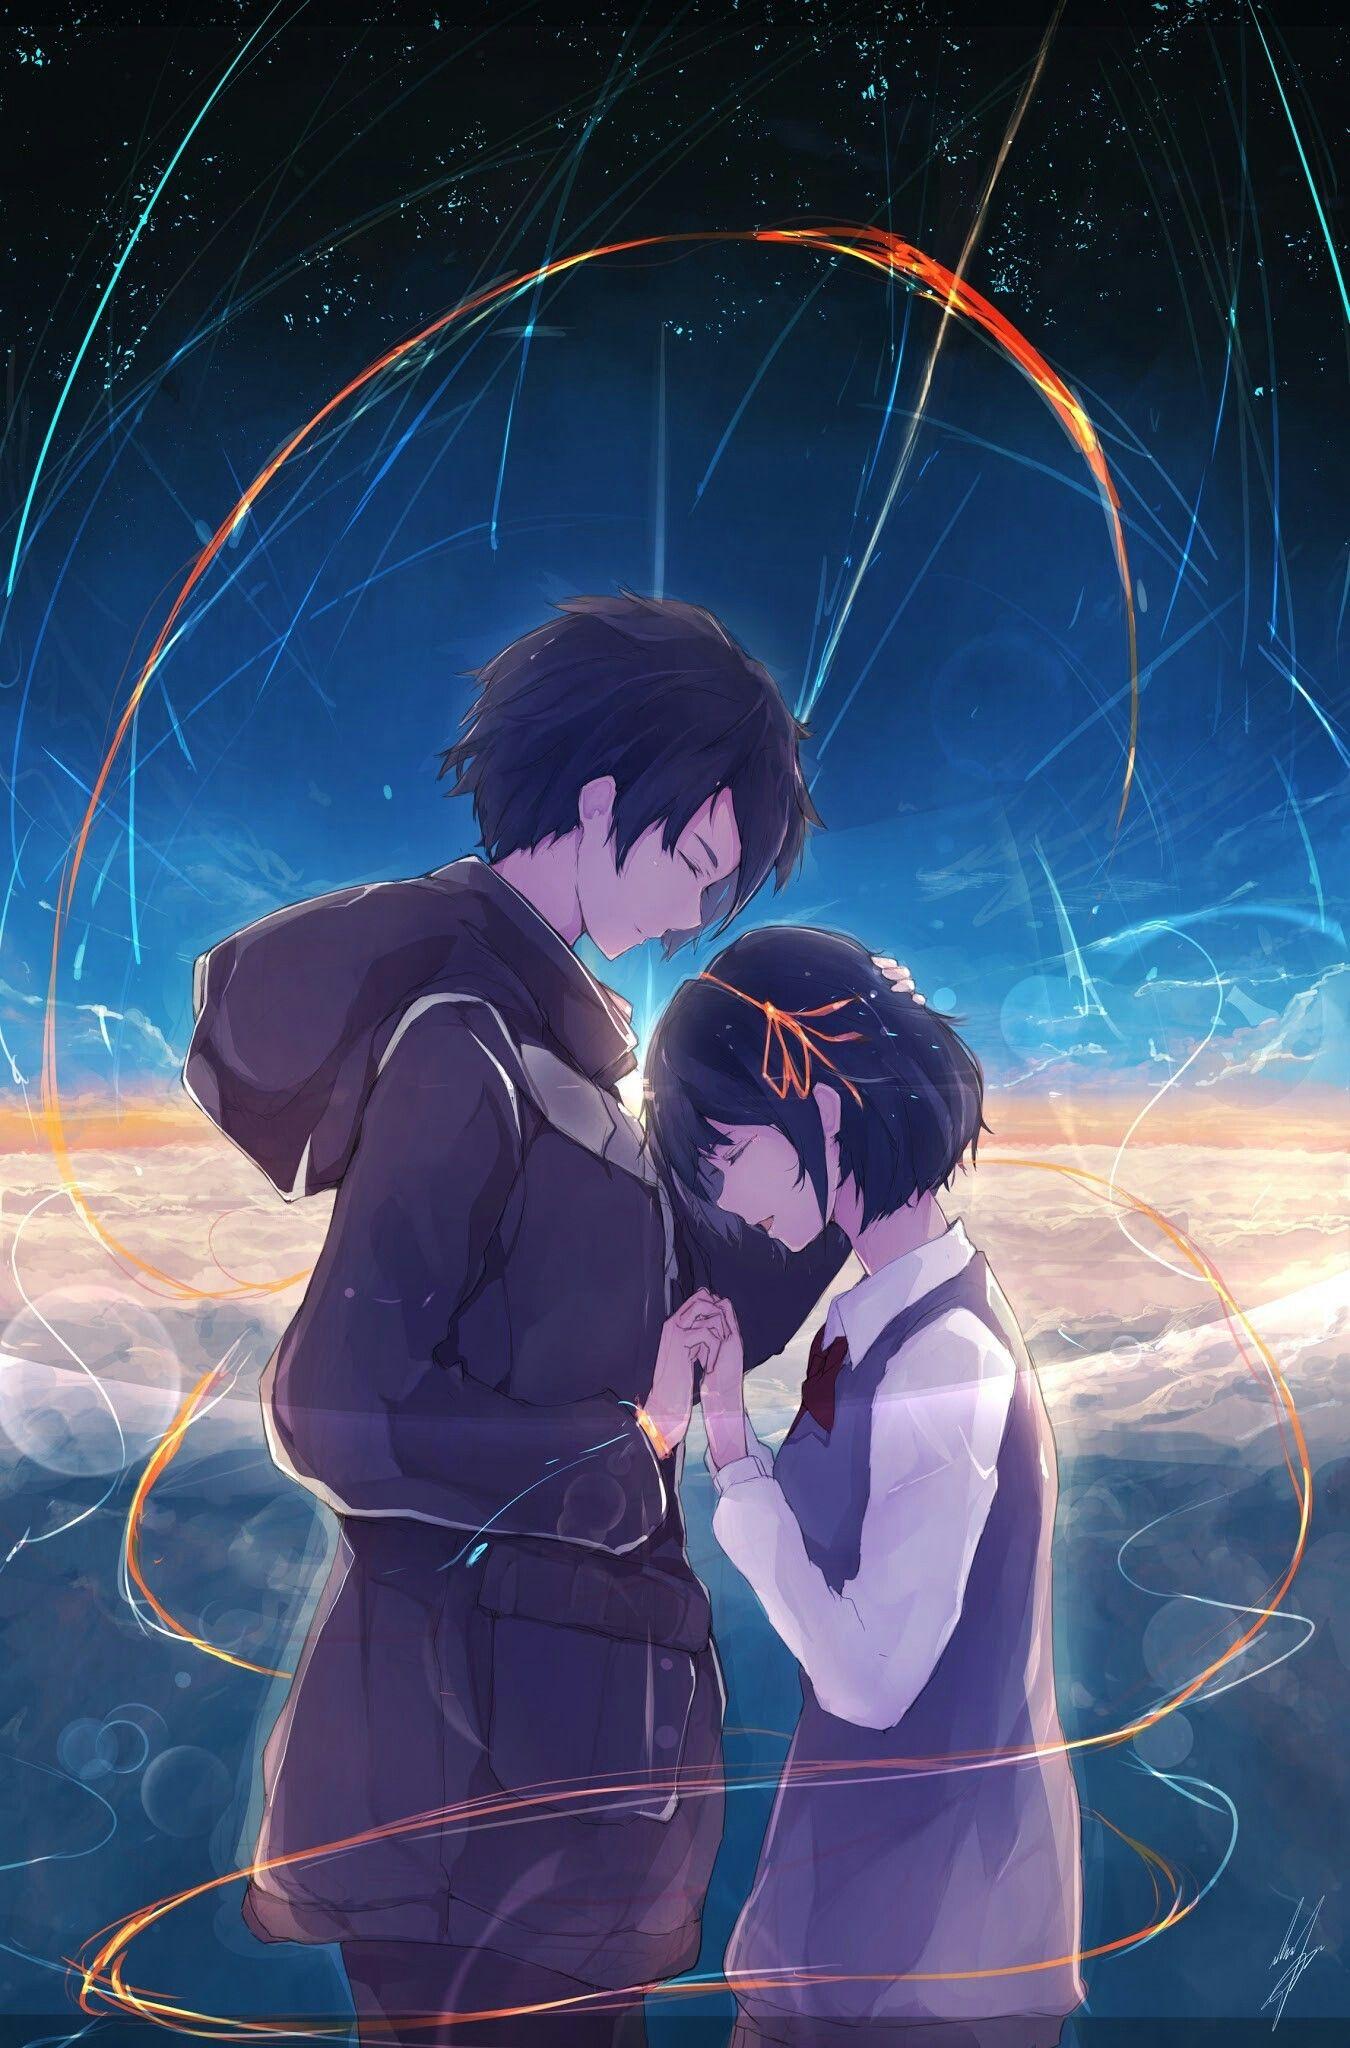 Pin by Nightshade Radtke on Art Your name anime, Kimi no